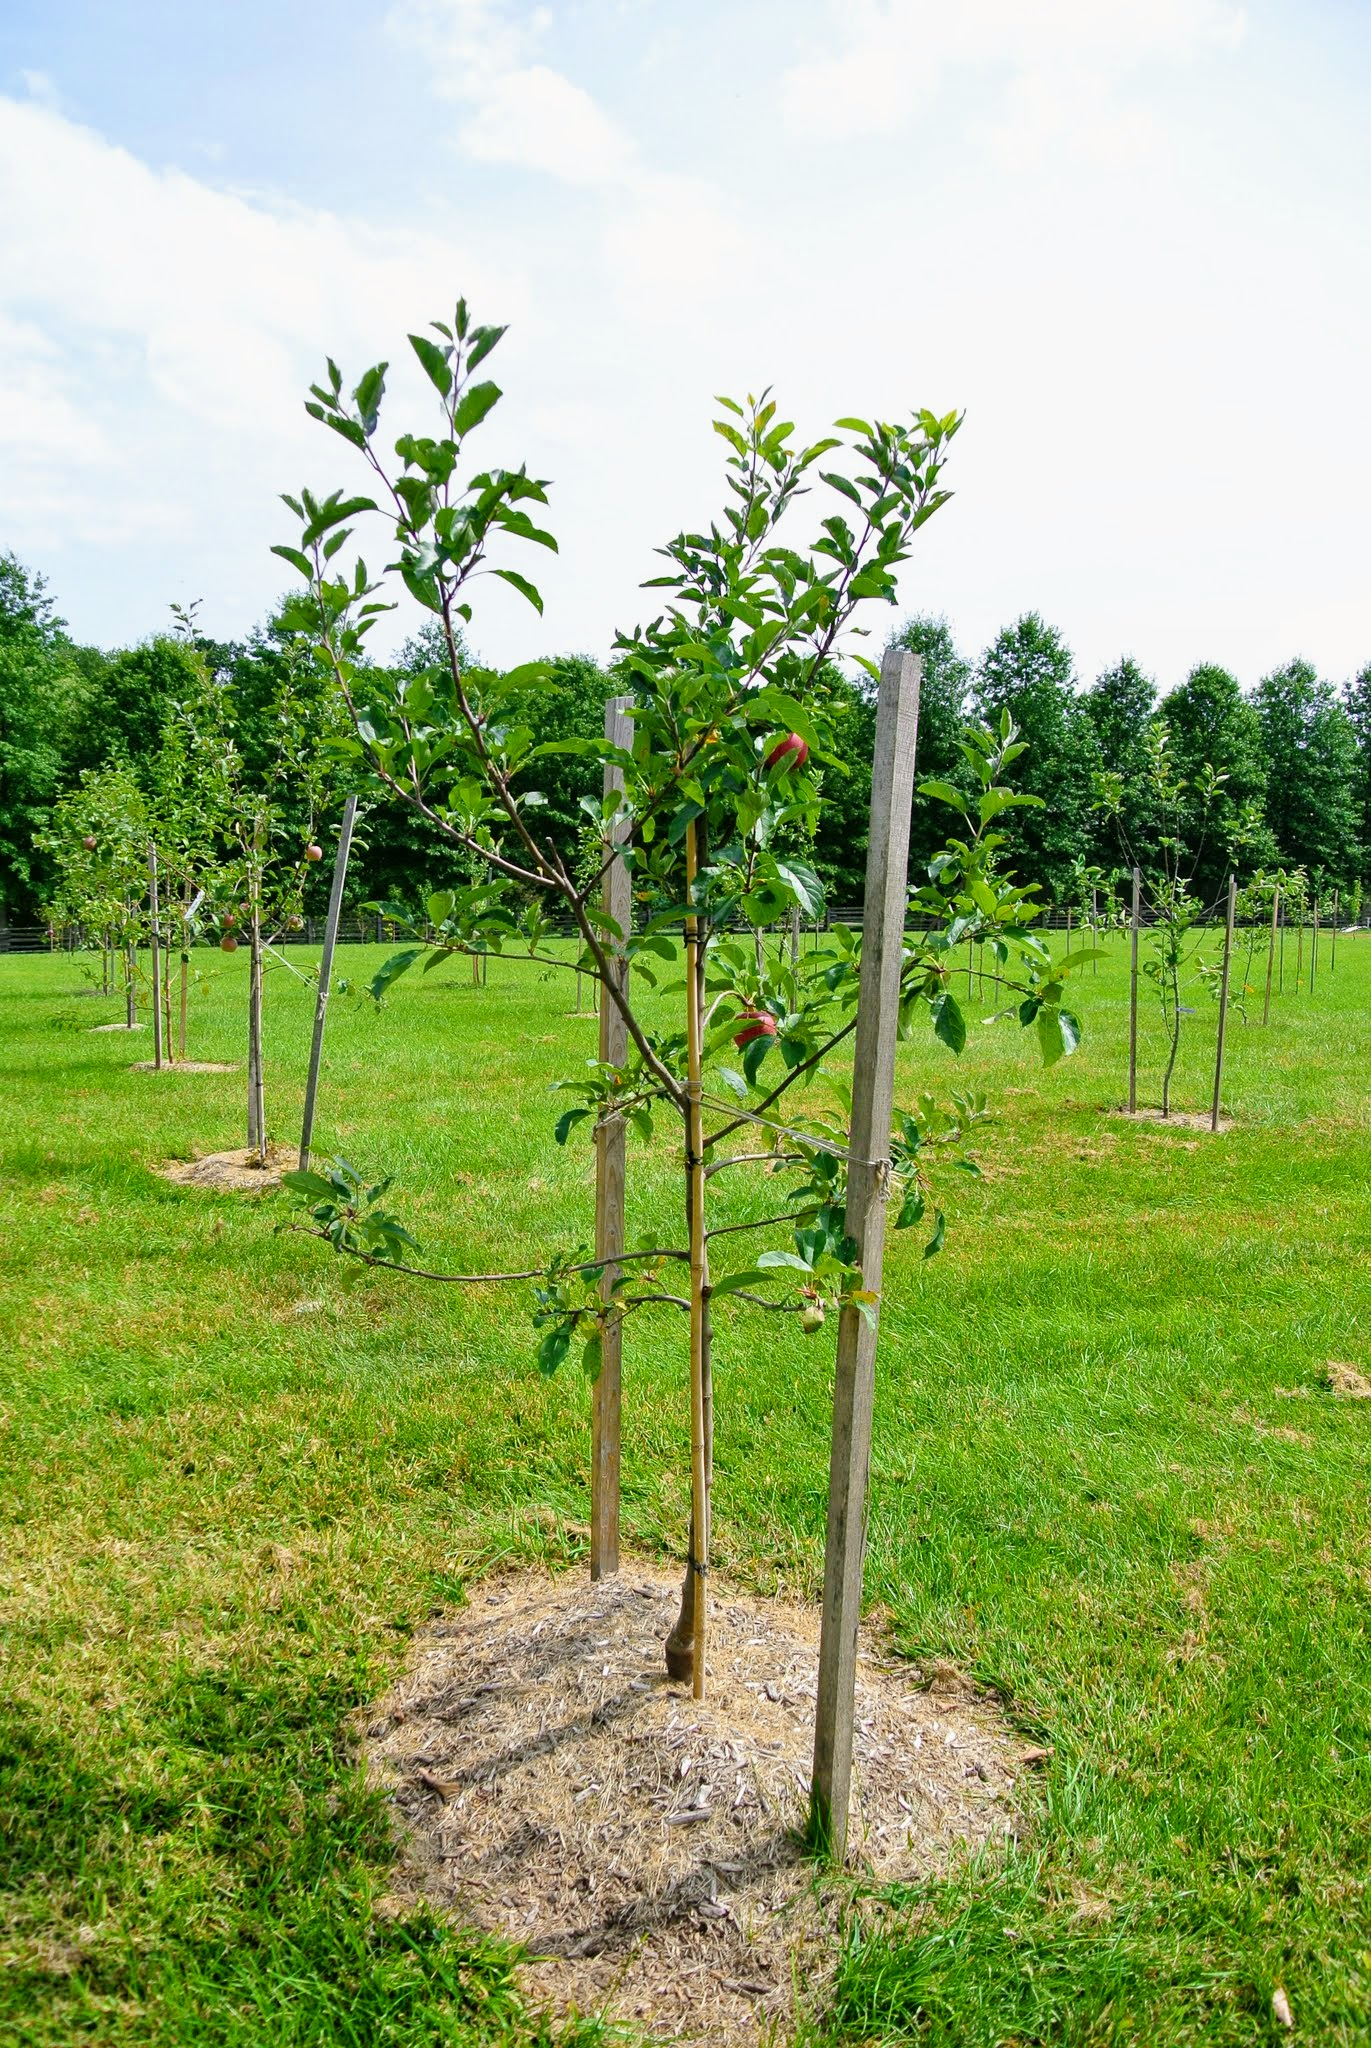 The Many Apple Trees at My Farm - The Martha Stewart Blog